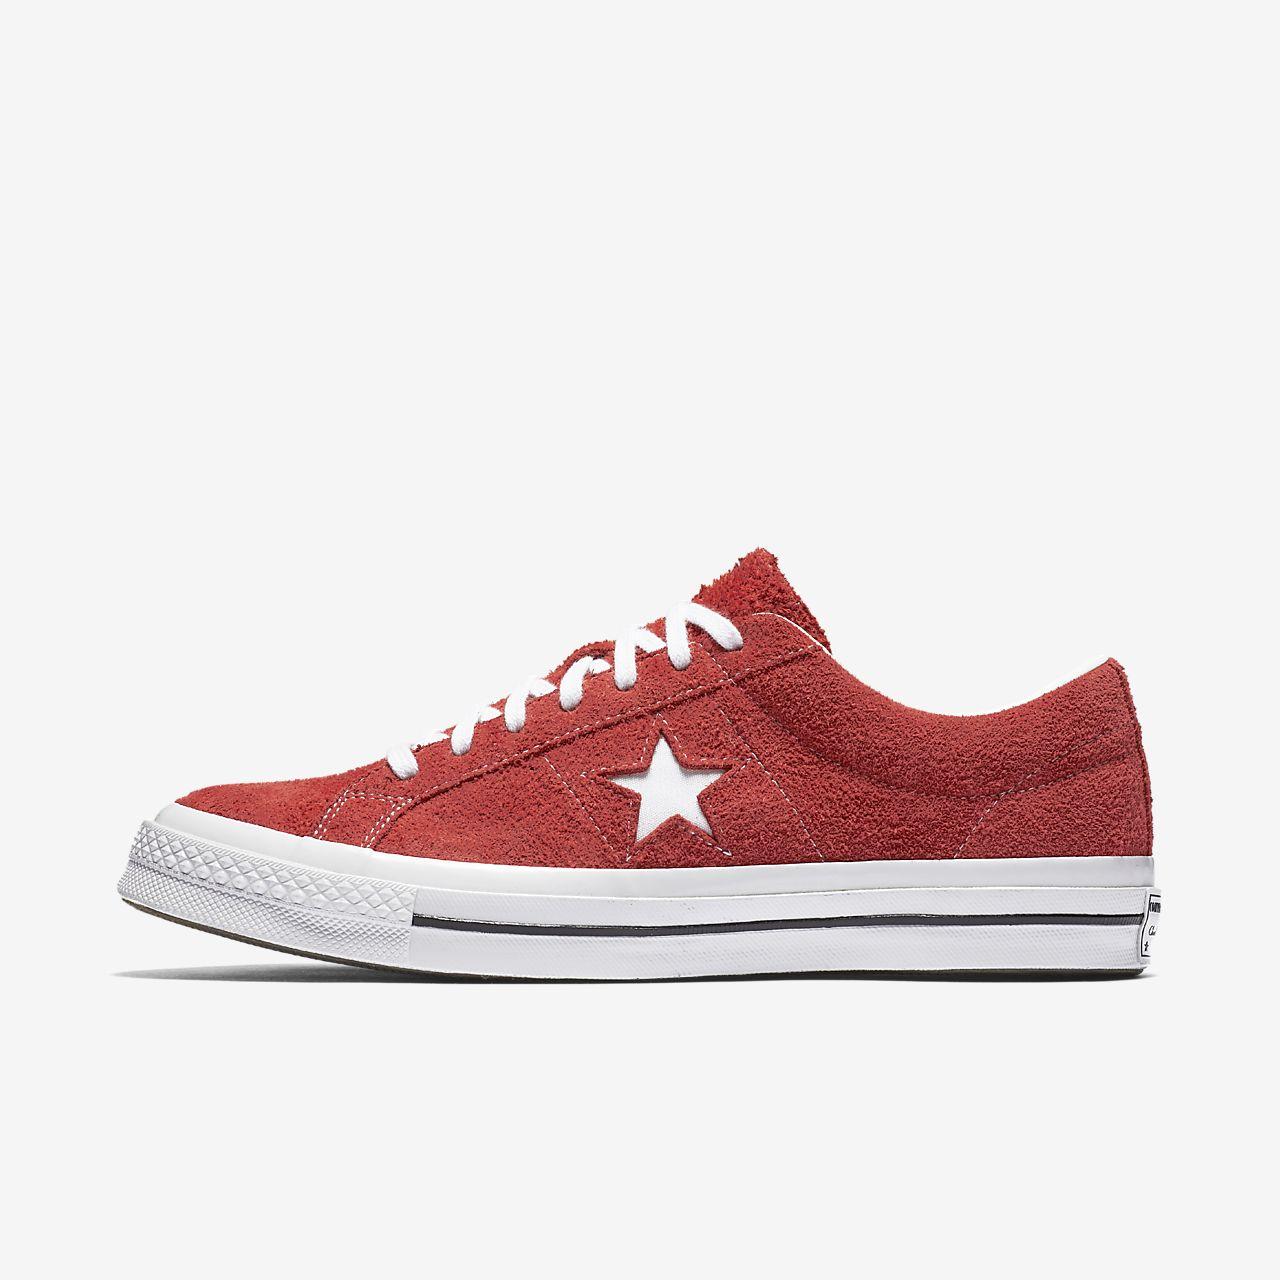 Converse One Star Premium Suede Low Top Unisex Shoe